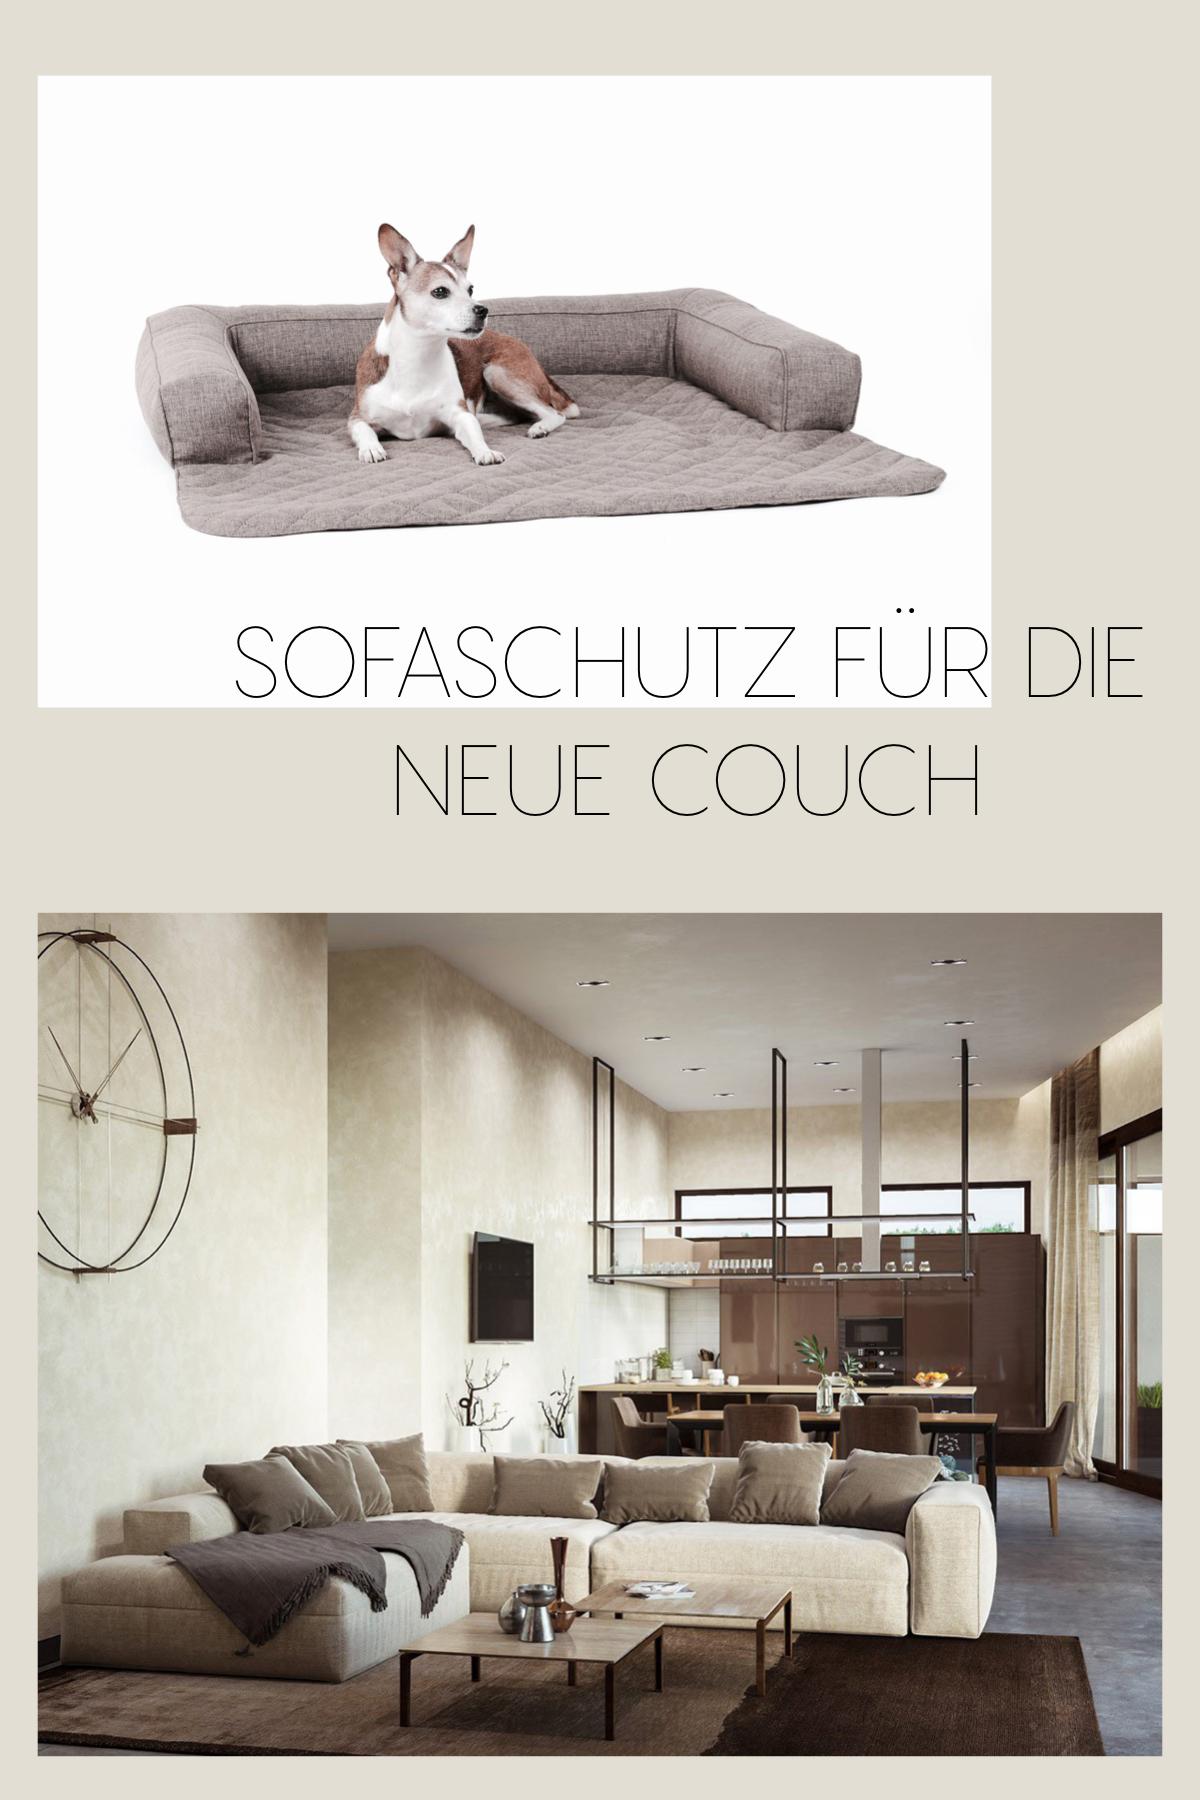 Hunde Sofaschutz Decke Dakota Softline 100x100 Cm Creme Sofaschutz Hund Sofa Hundekissen